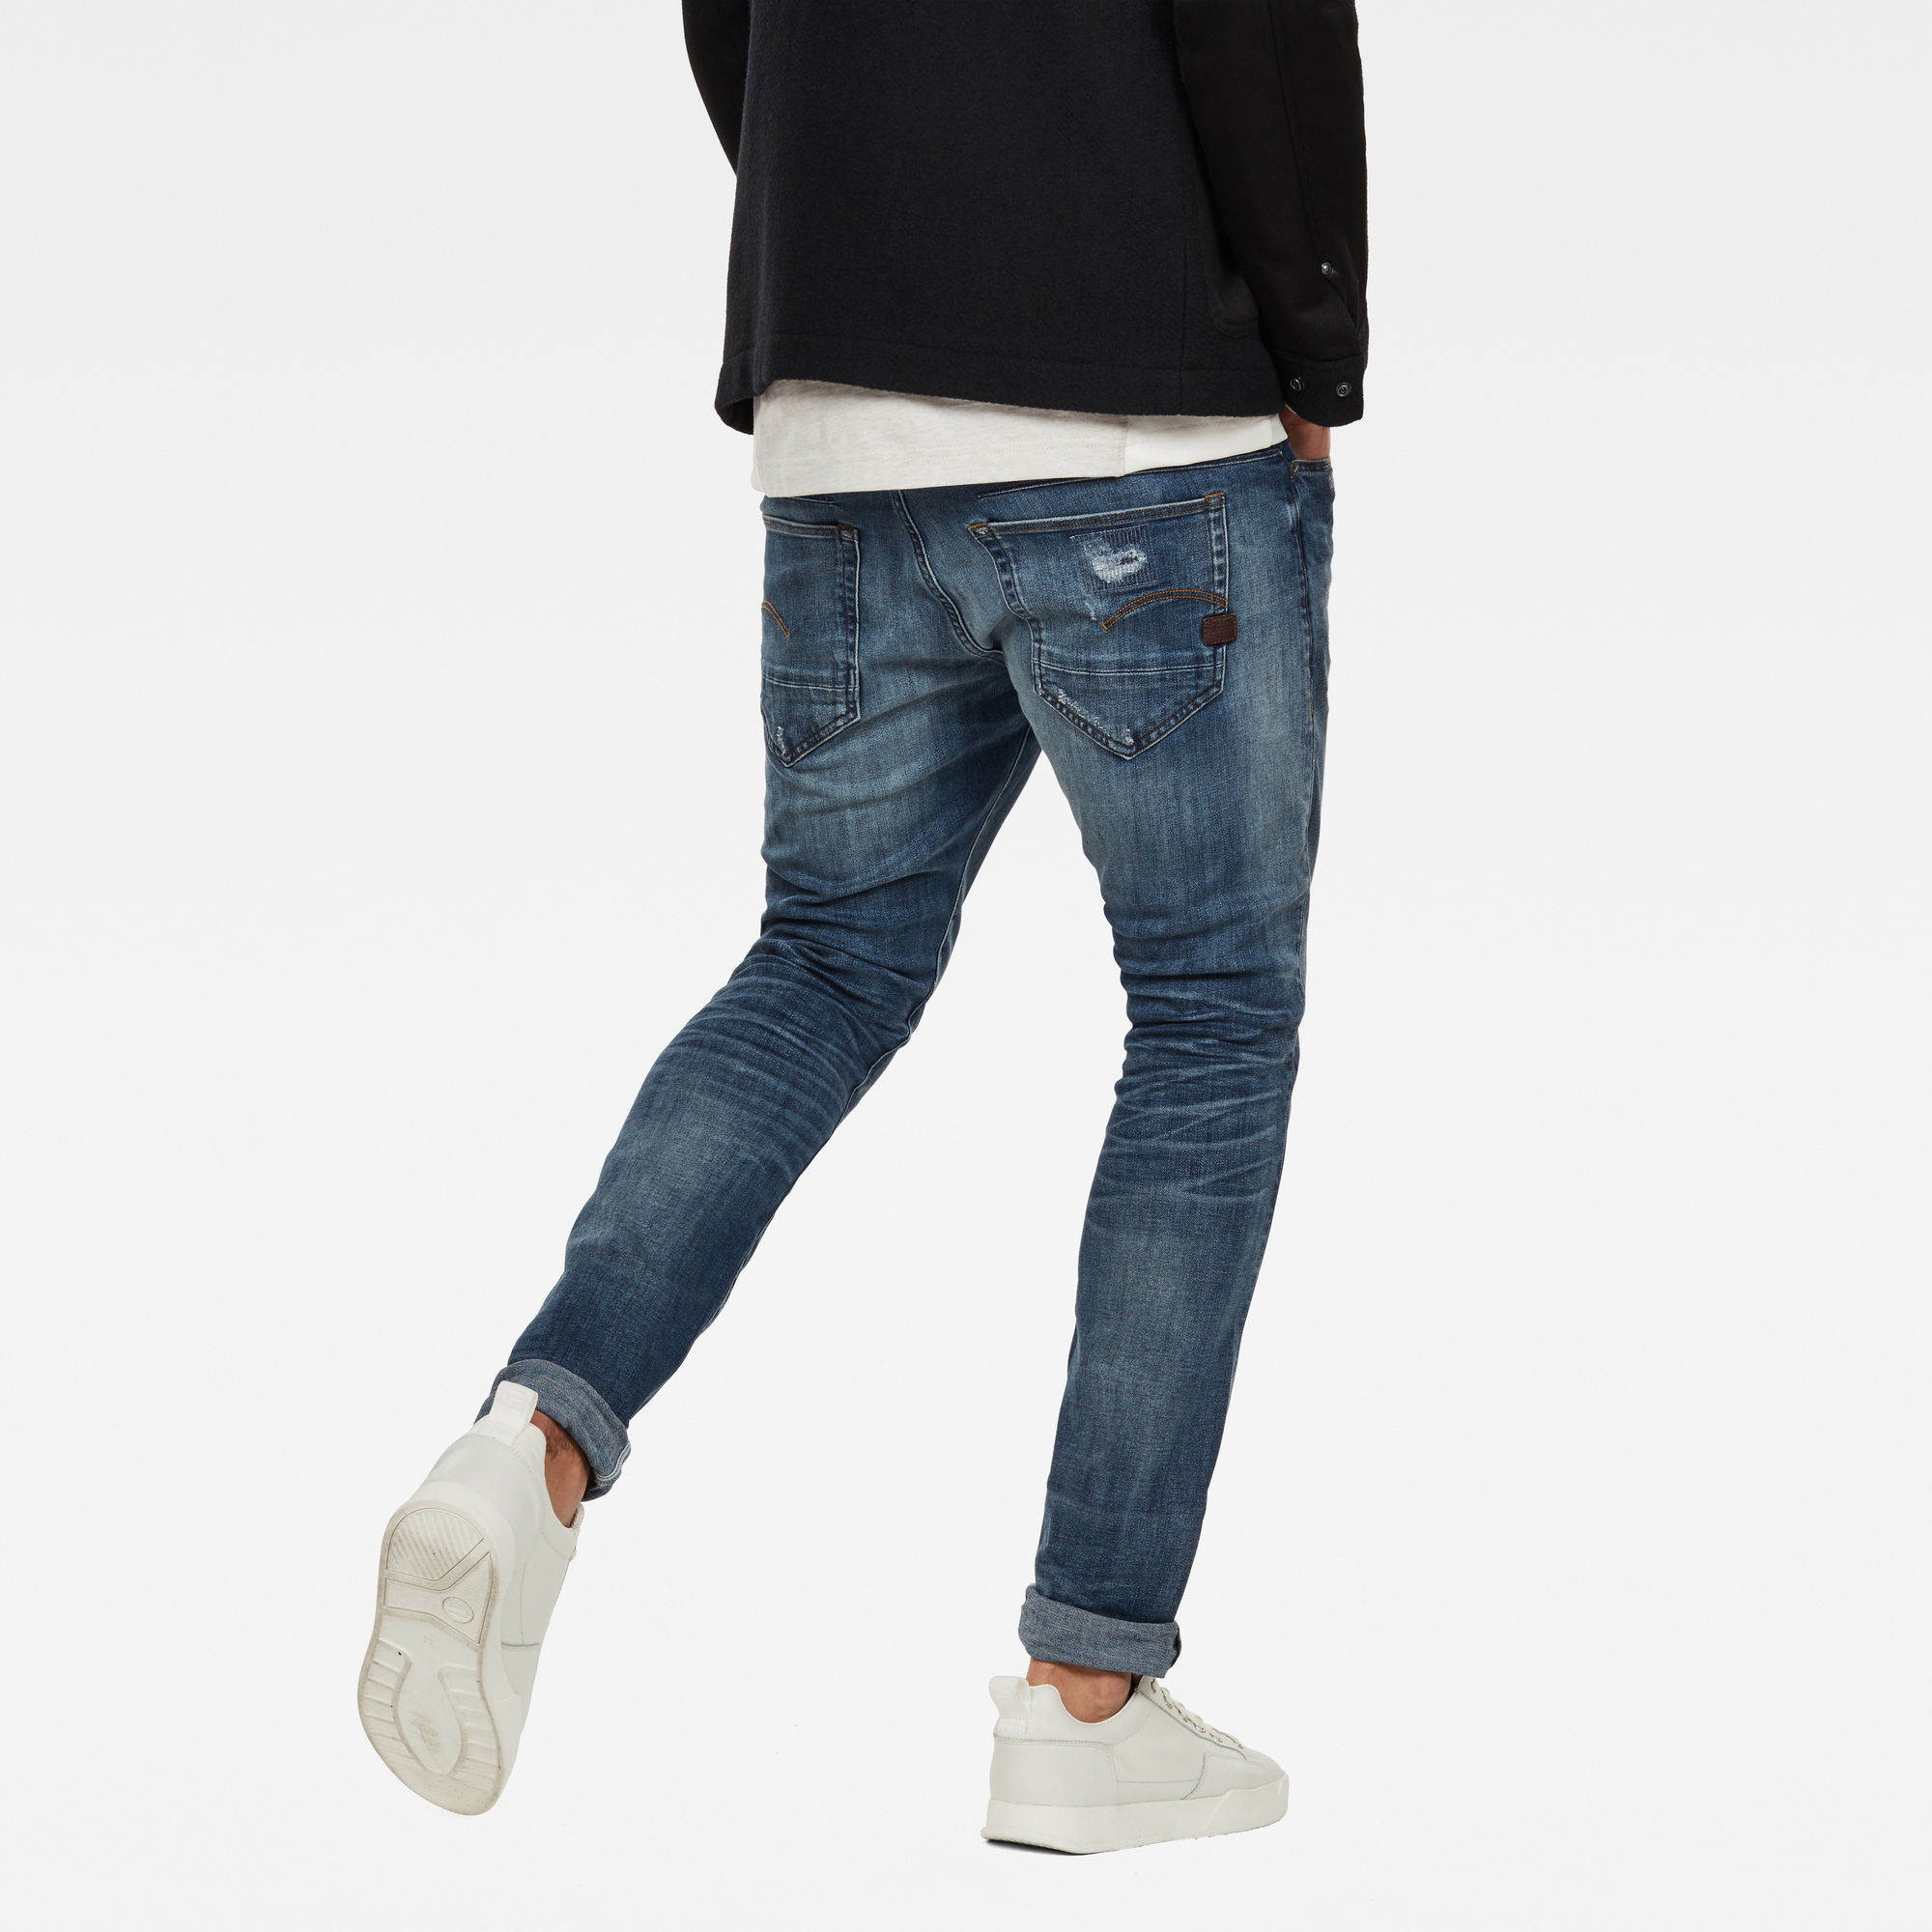 D-Staq 5-Pocket Super Slim Jeans